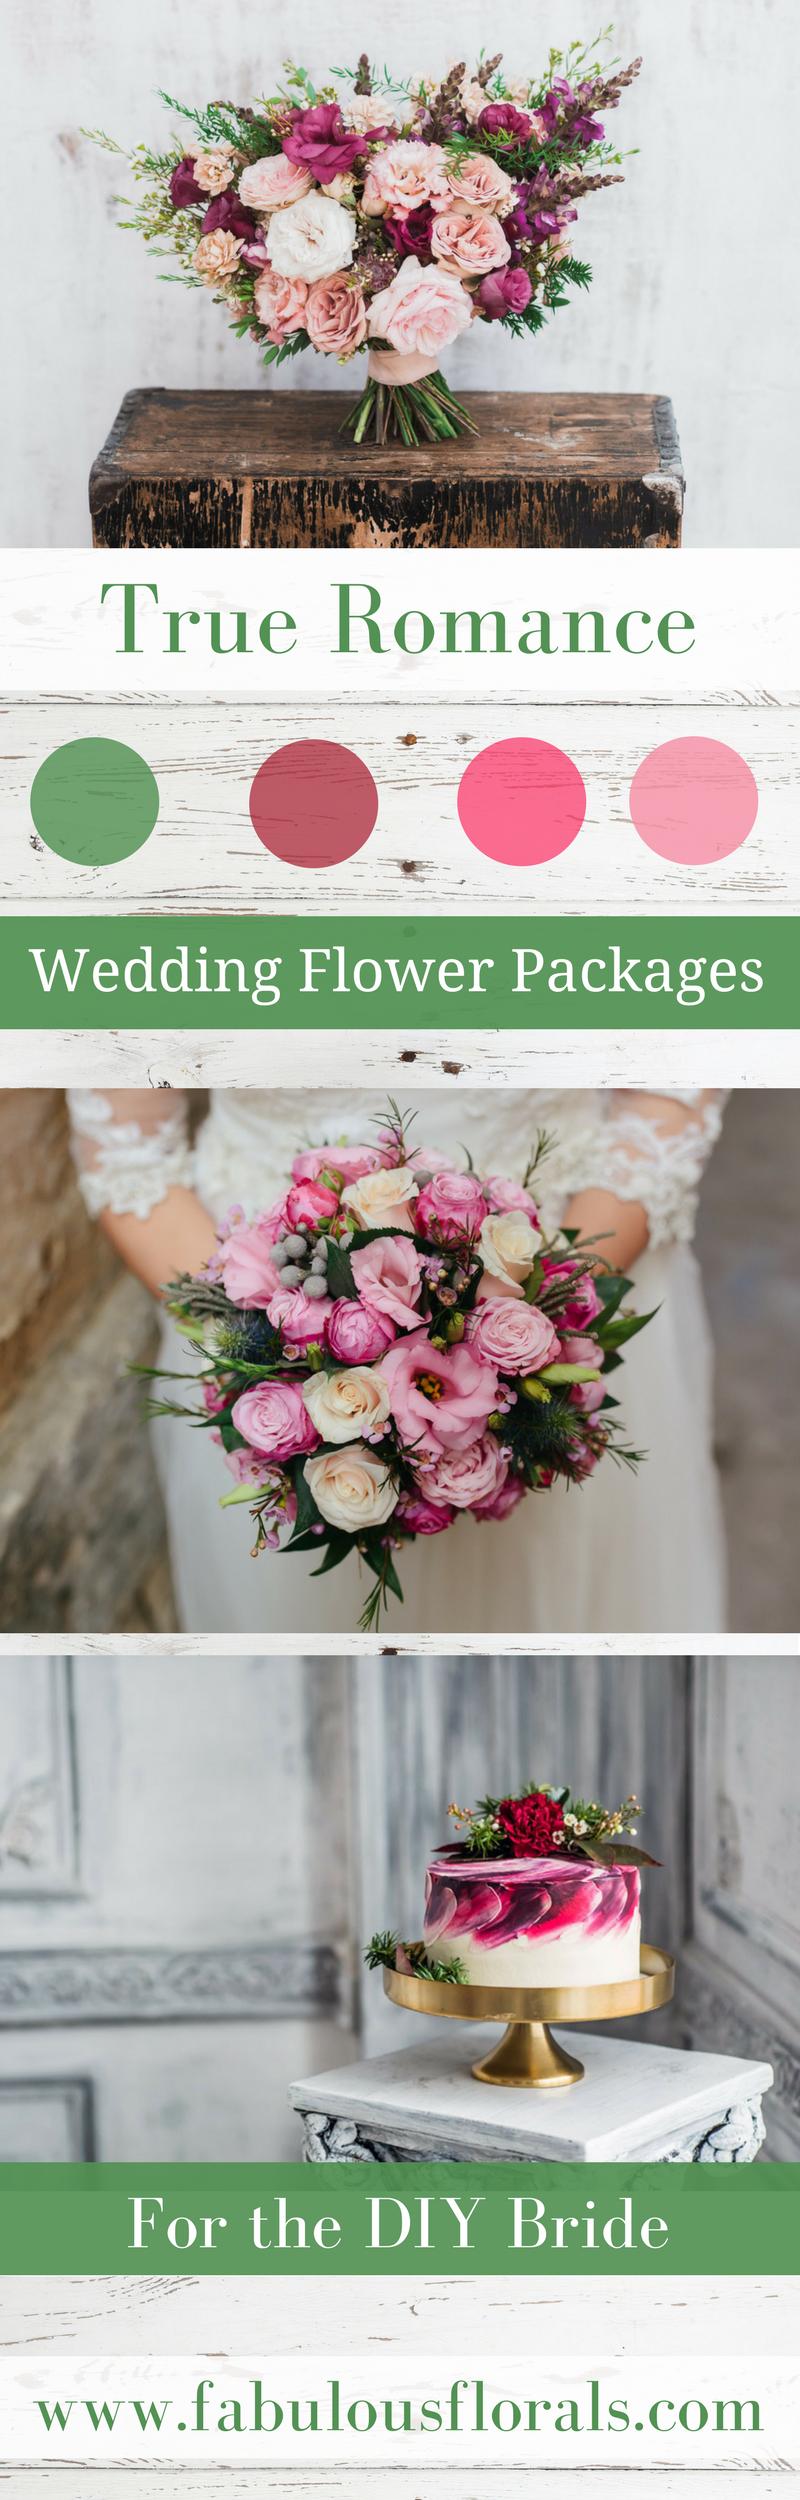 DIY Wedding Flowers Ideas Inspiration Diy wedding bouquet